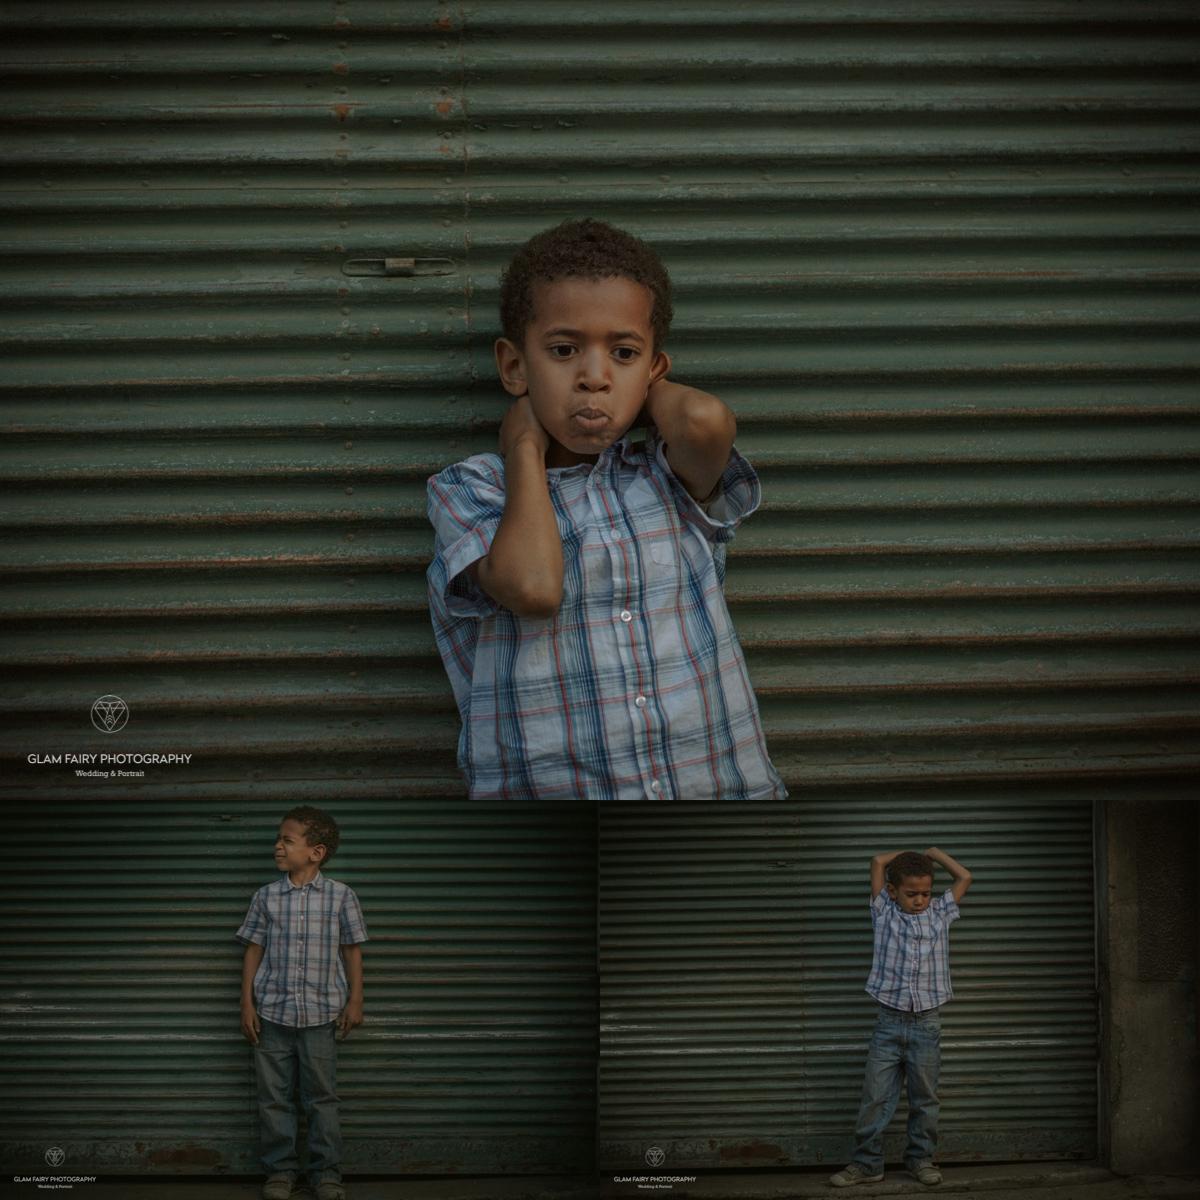 GlamFairyPhotography-photographe-seance-enfant-american vintage-alfortville-Nathan_0011